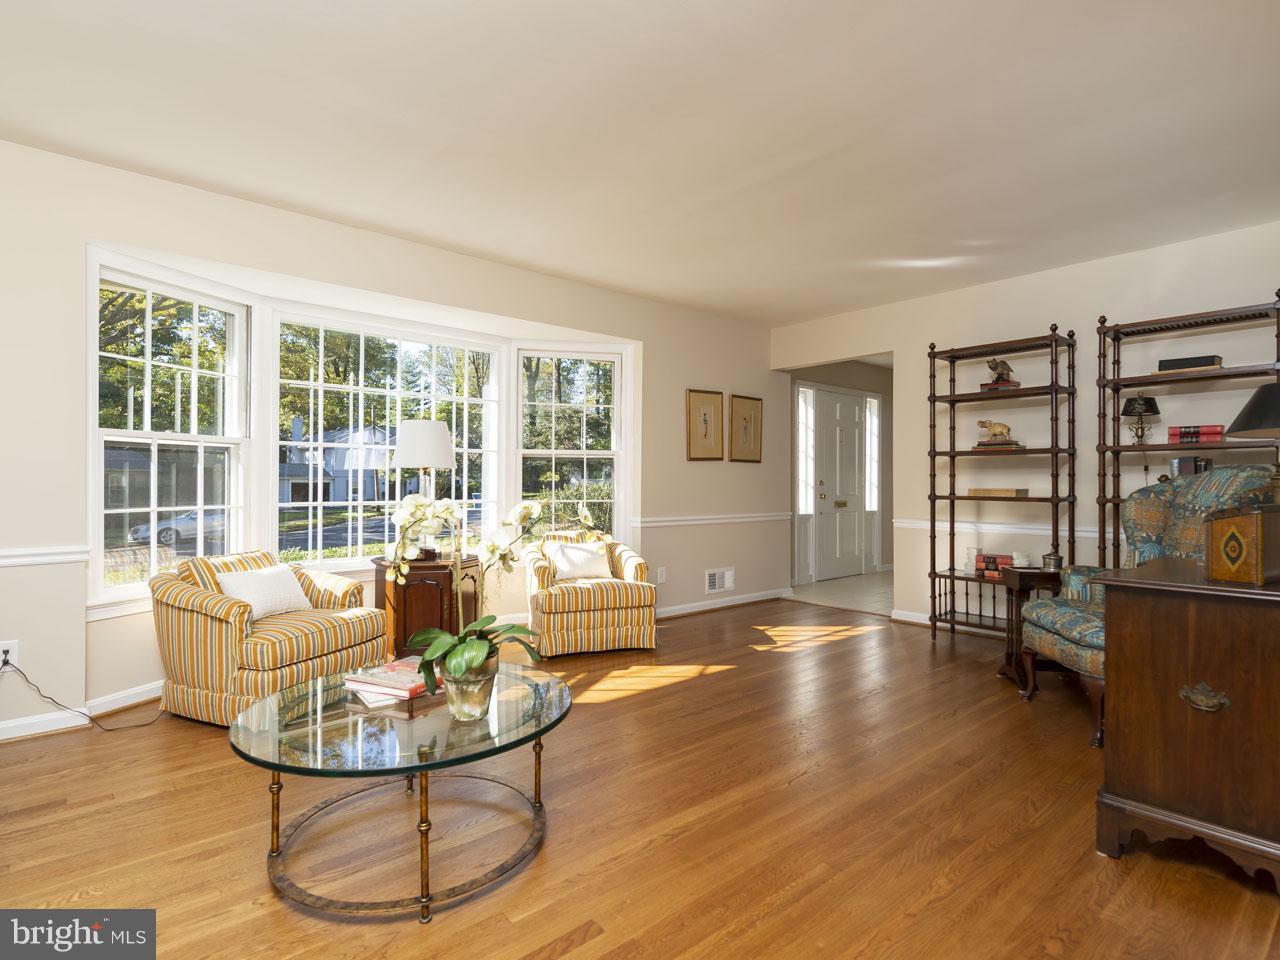 1010014728-300953034810-2021-09-05-13-50-25  |   | Annandale Delaware Real Estate For Sale | MLS# 1010014728  - Best of Northern Virginia